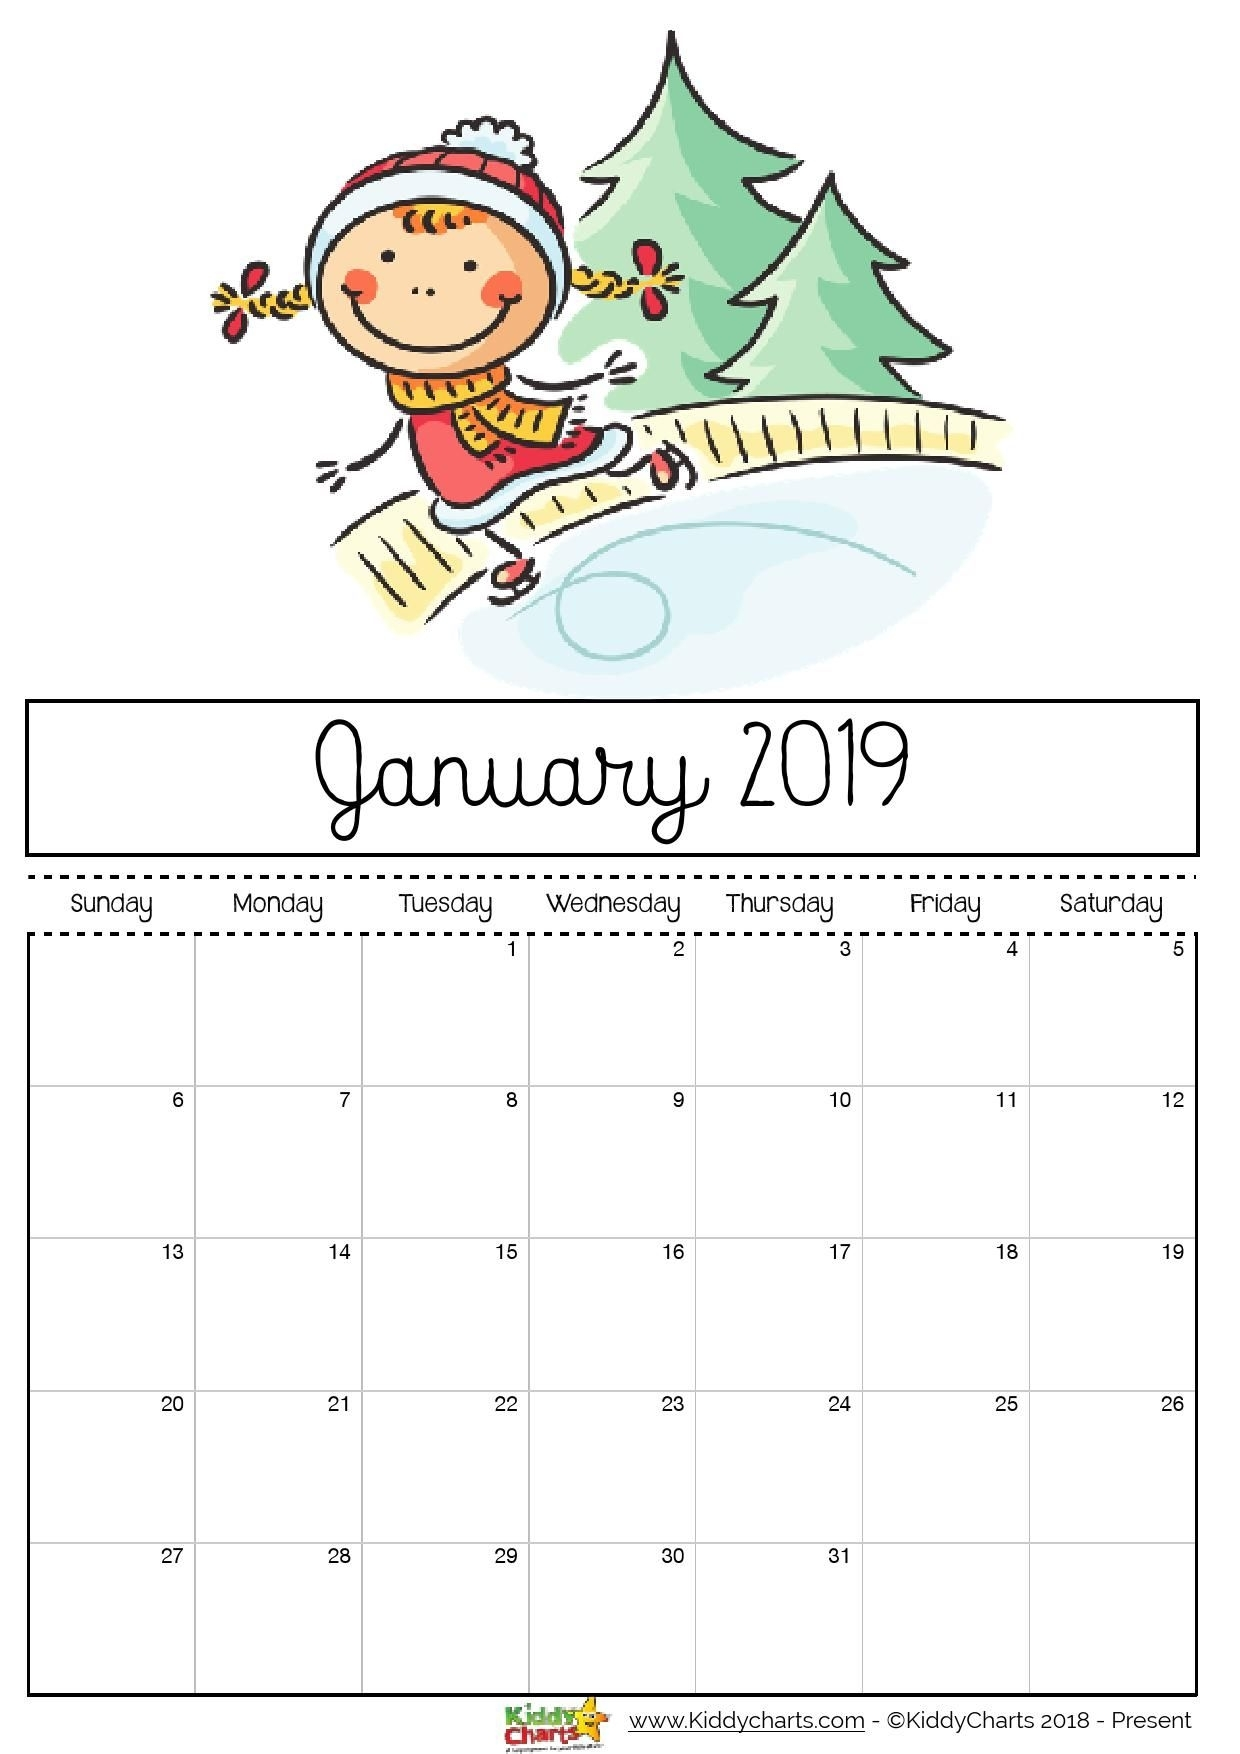 Free Printable 2019 Calendar - Print Yours Here | Planner | Calendar